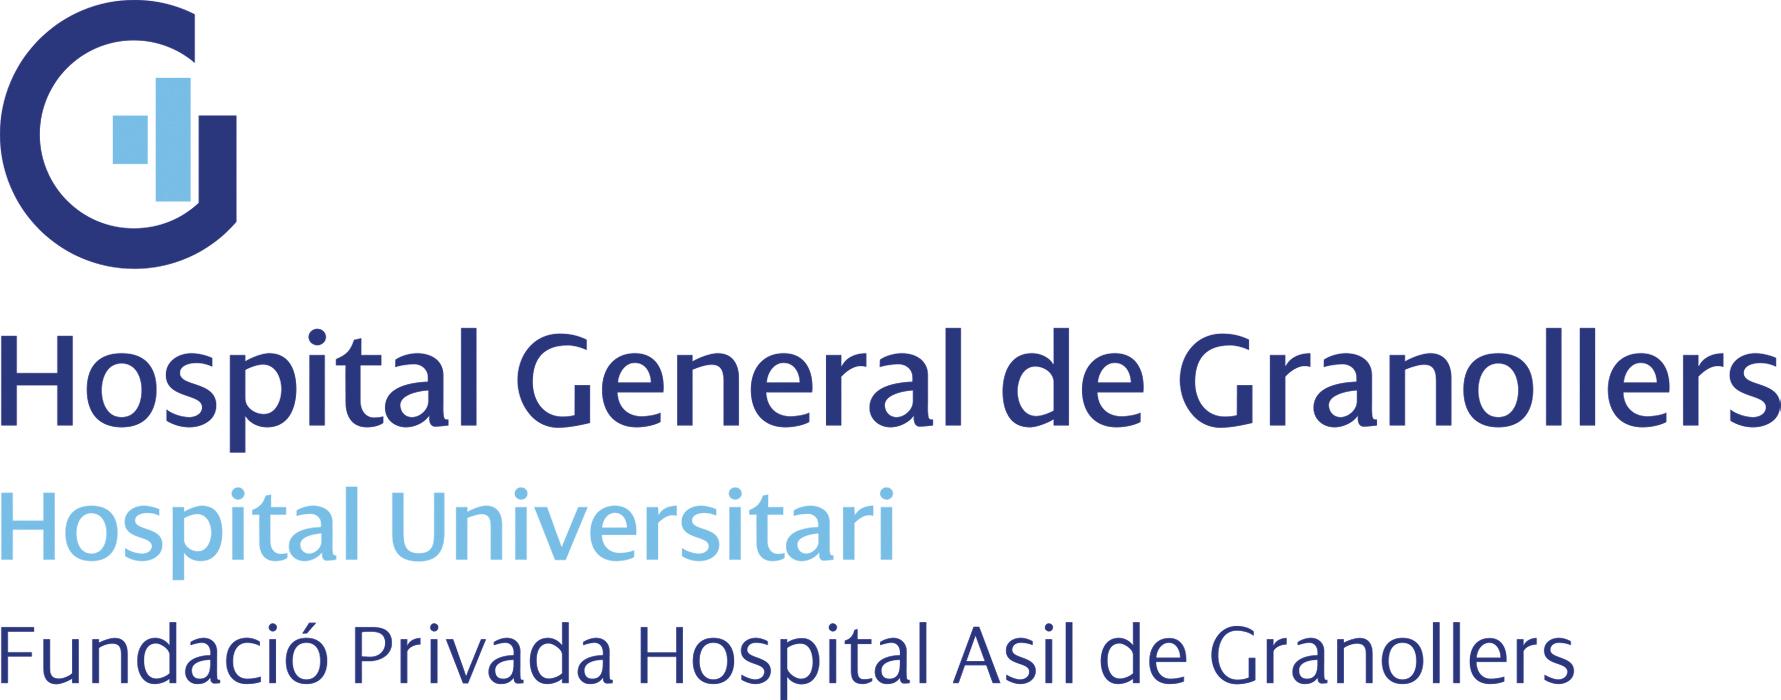 Hospital de Granollers